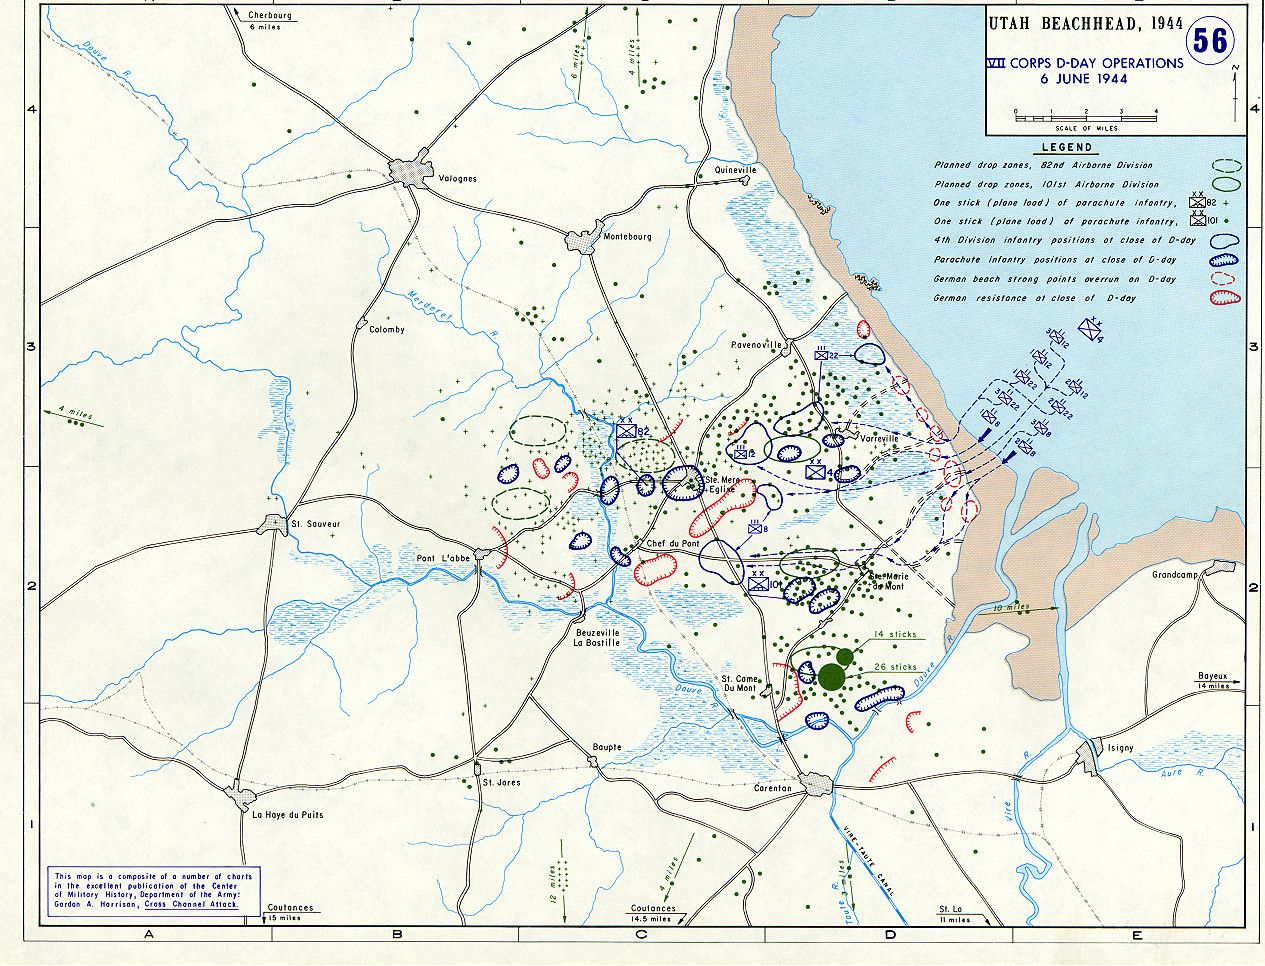 The planned drop zones of American paratroopers near Utah